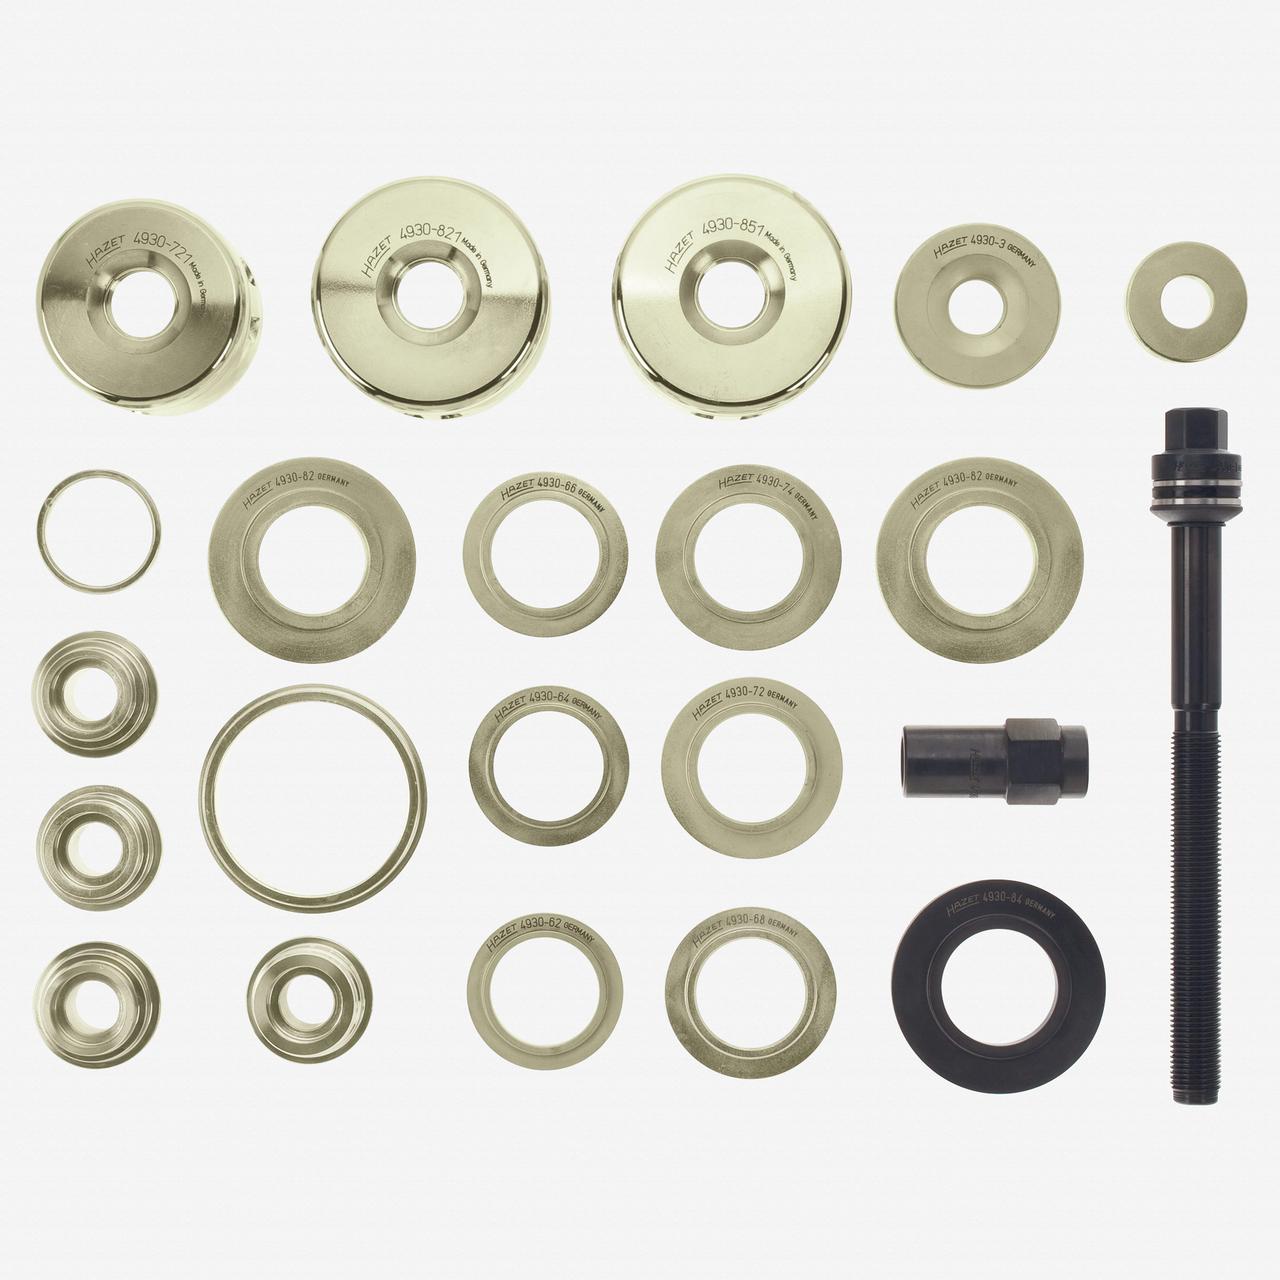 Hazet 4930-1/22 Wheel bearing tool set, 22 pieces, hydraulic  - KC Tool